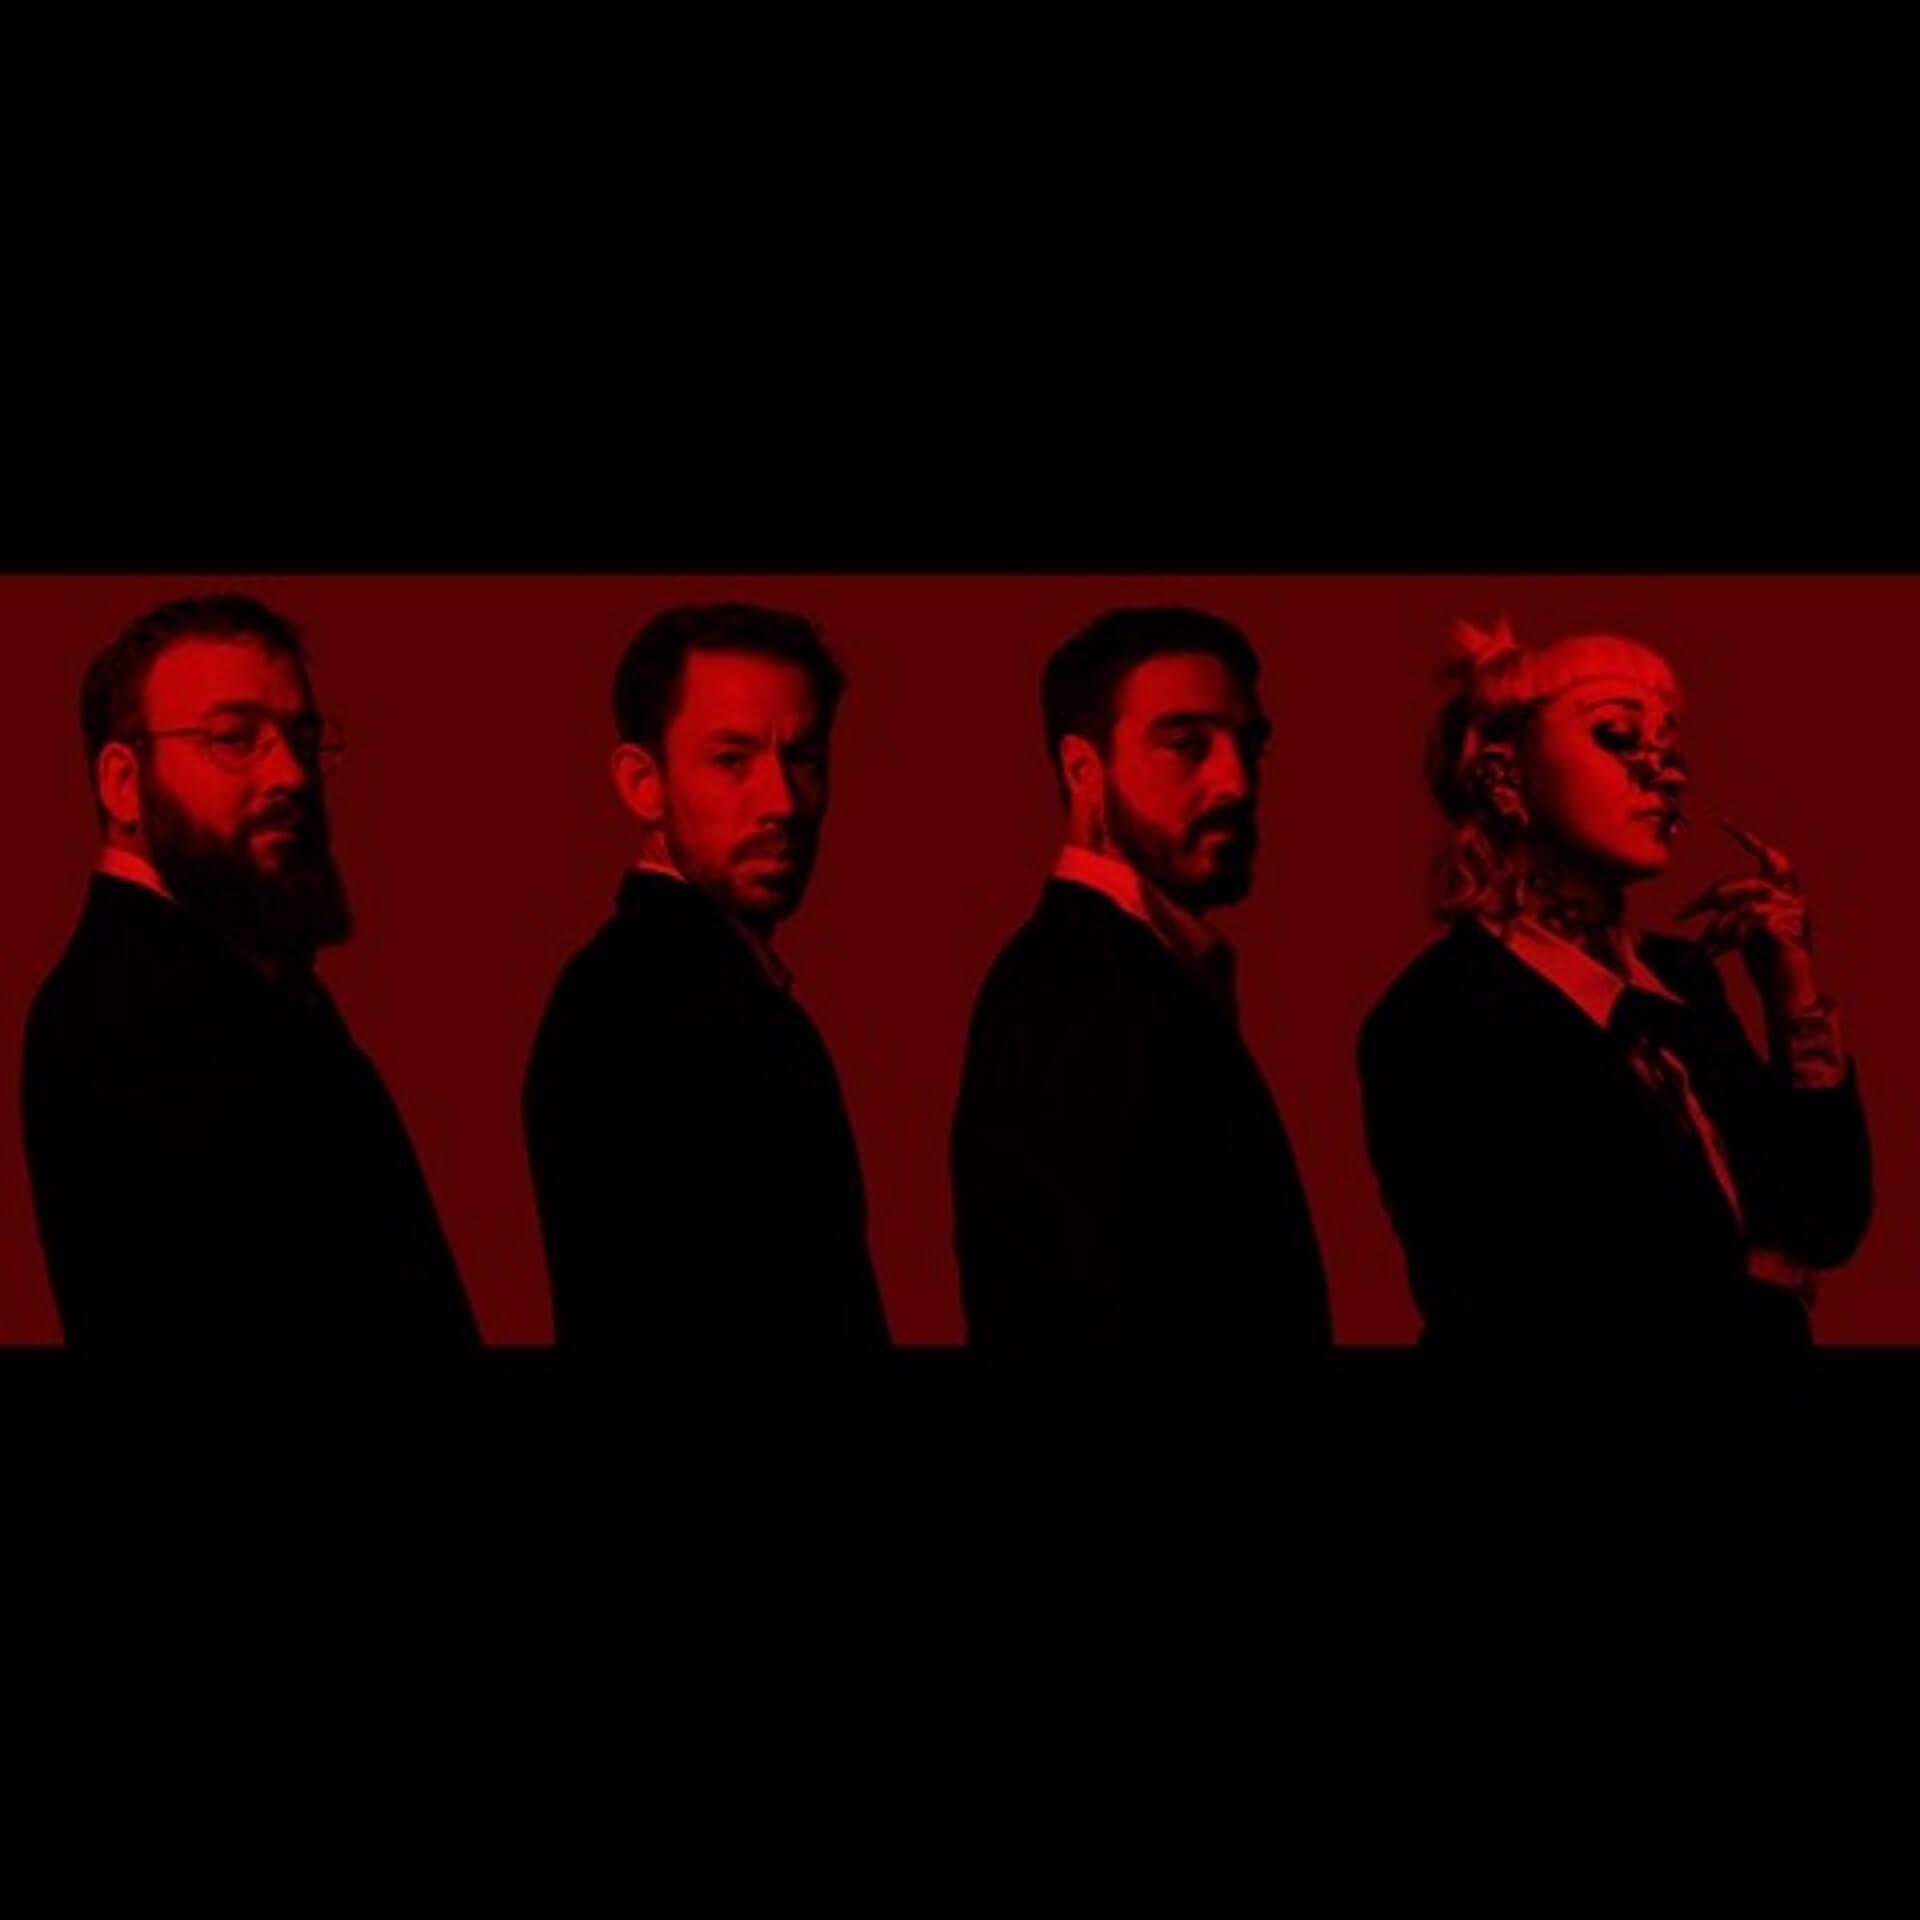 "Hiatus Kaiyoteが6月発売の新アルバム『Mood Valiant』収録曲""Red Room""をMVと共にリリース! music210427_hiatus-kaiyote-210427_3"